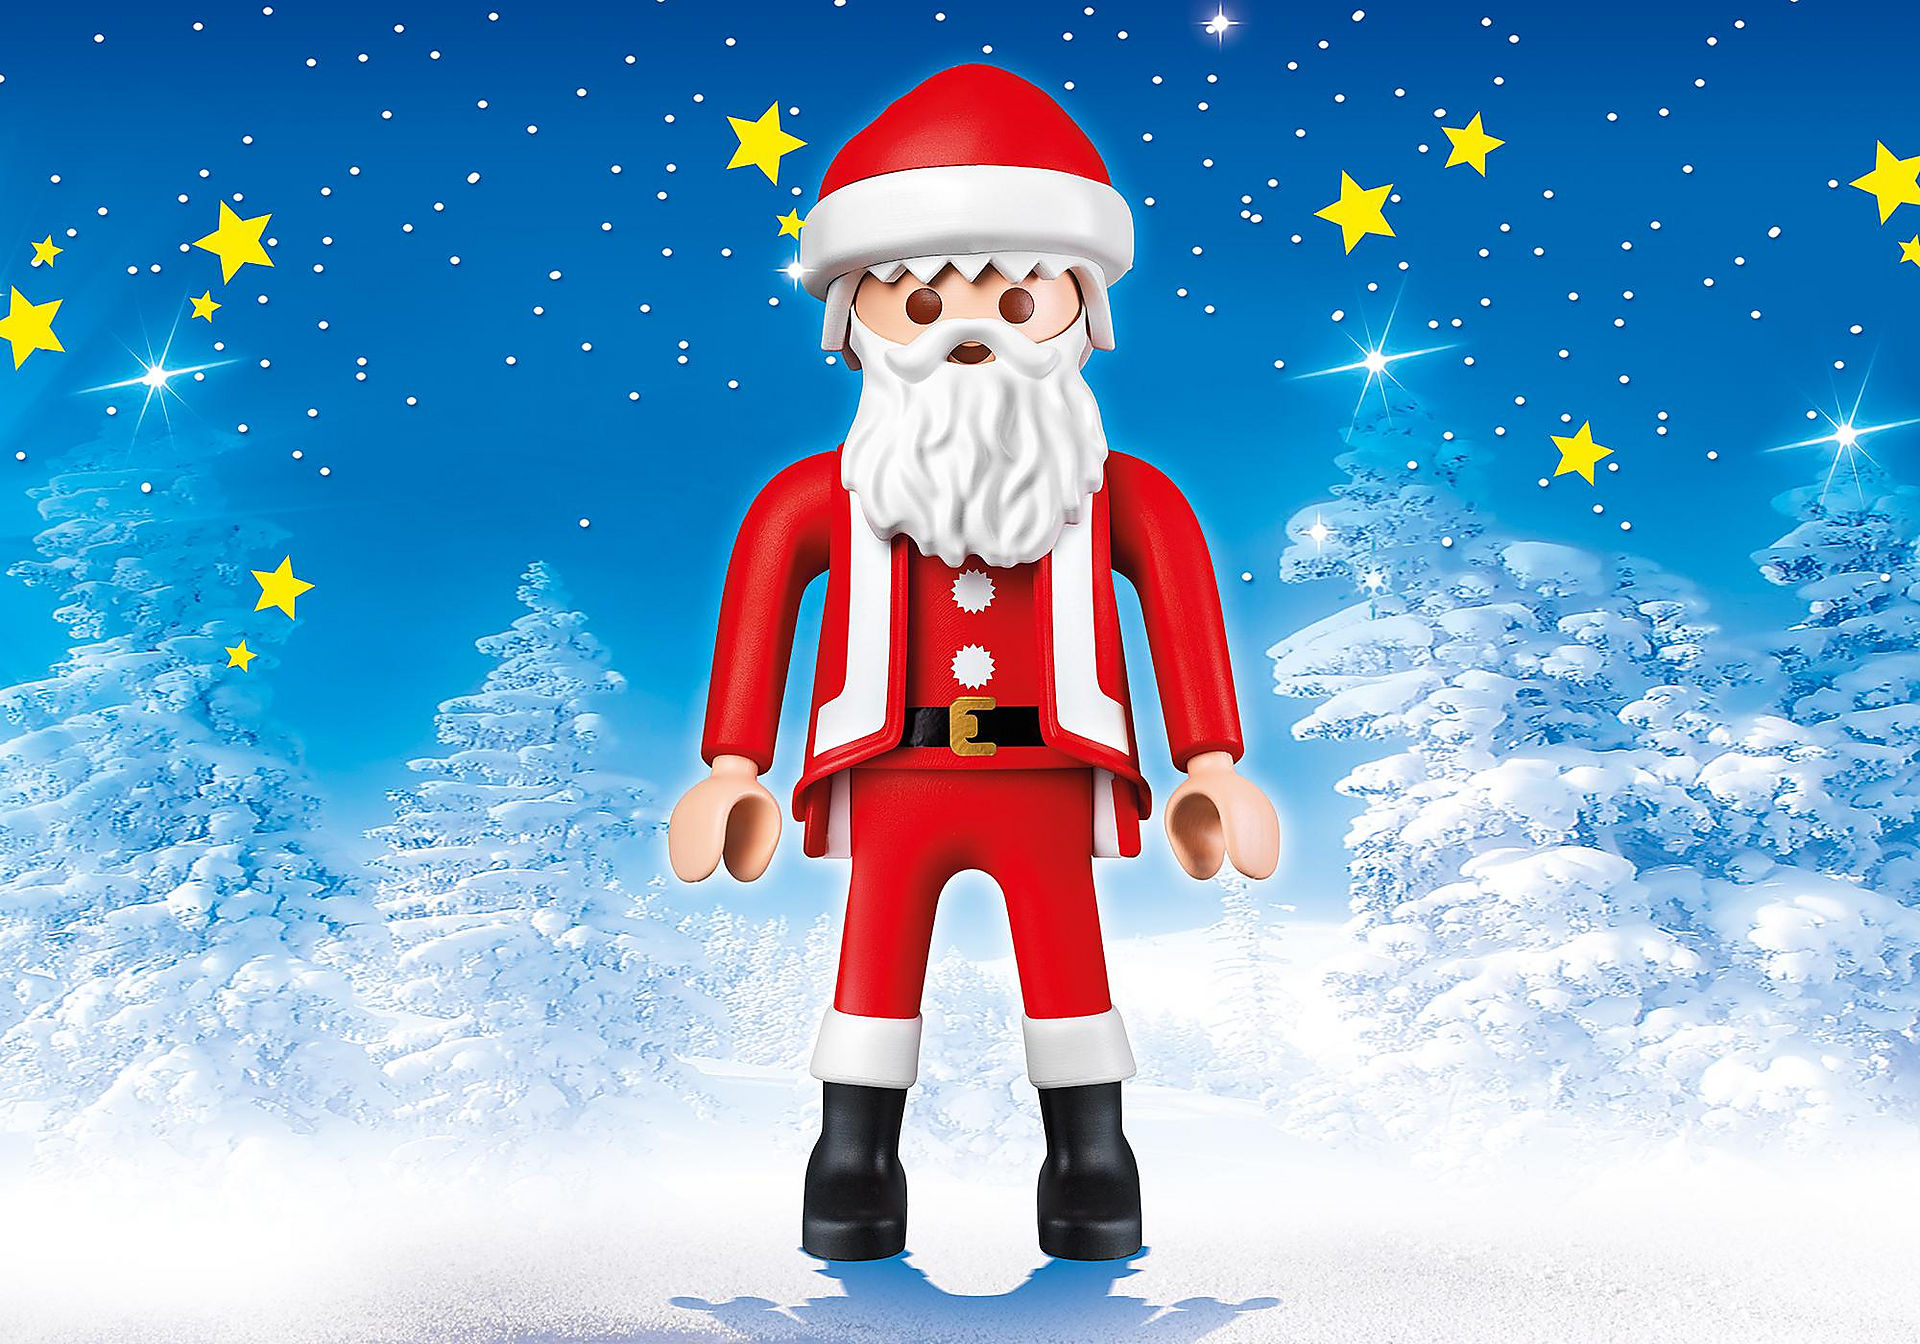 6629 PLAYMOBIL XXL-Weihnachtsmann zoom image3